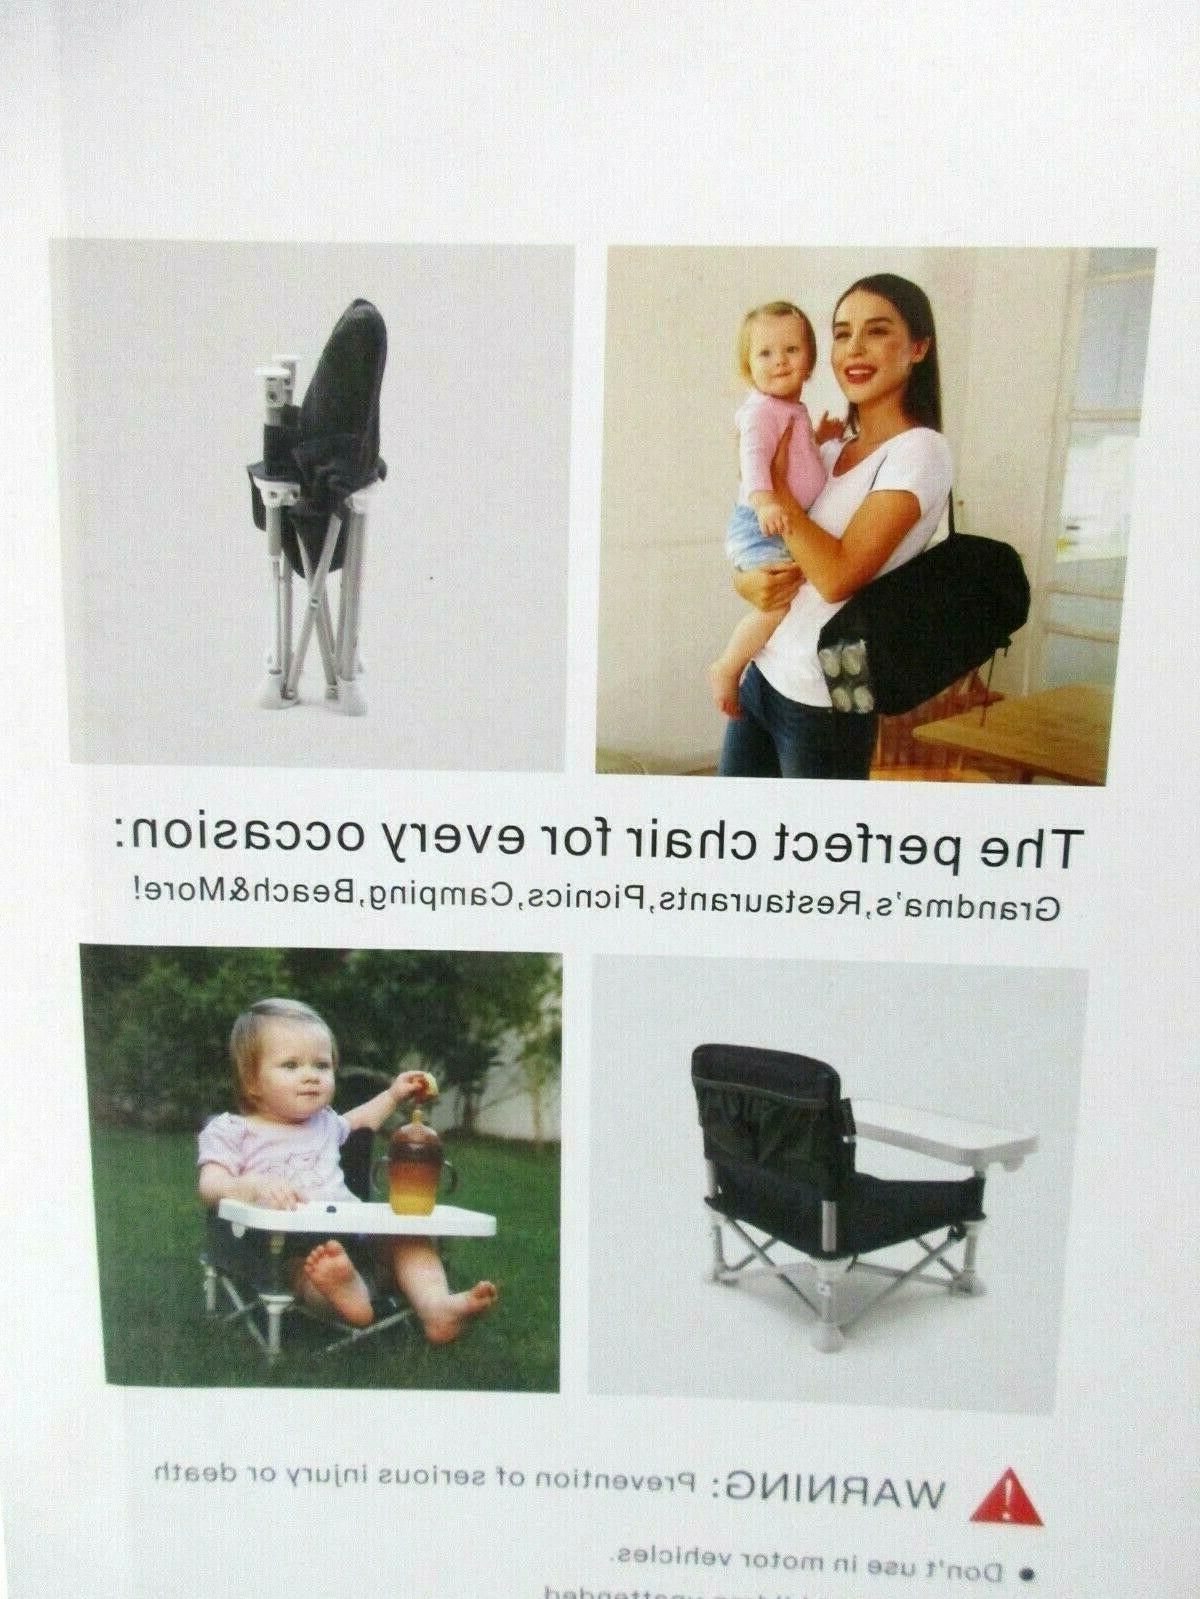 Veeyoo travel w/Tray Portable High Chair